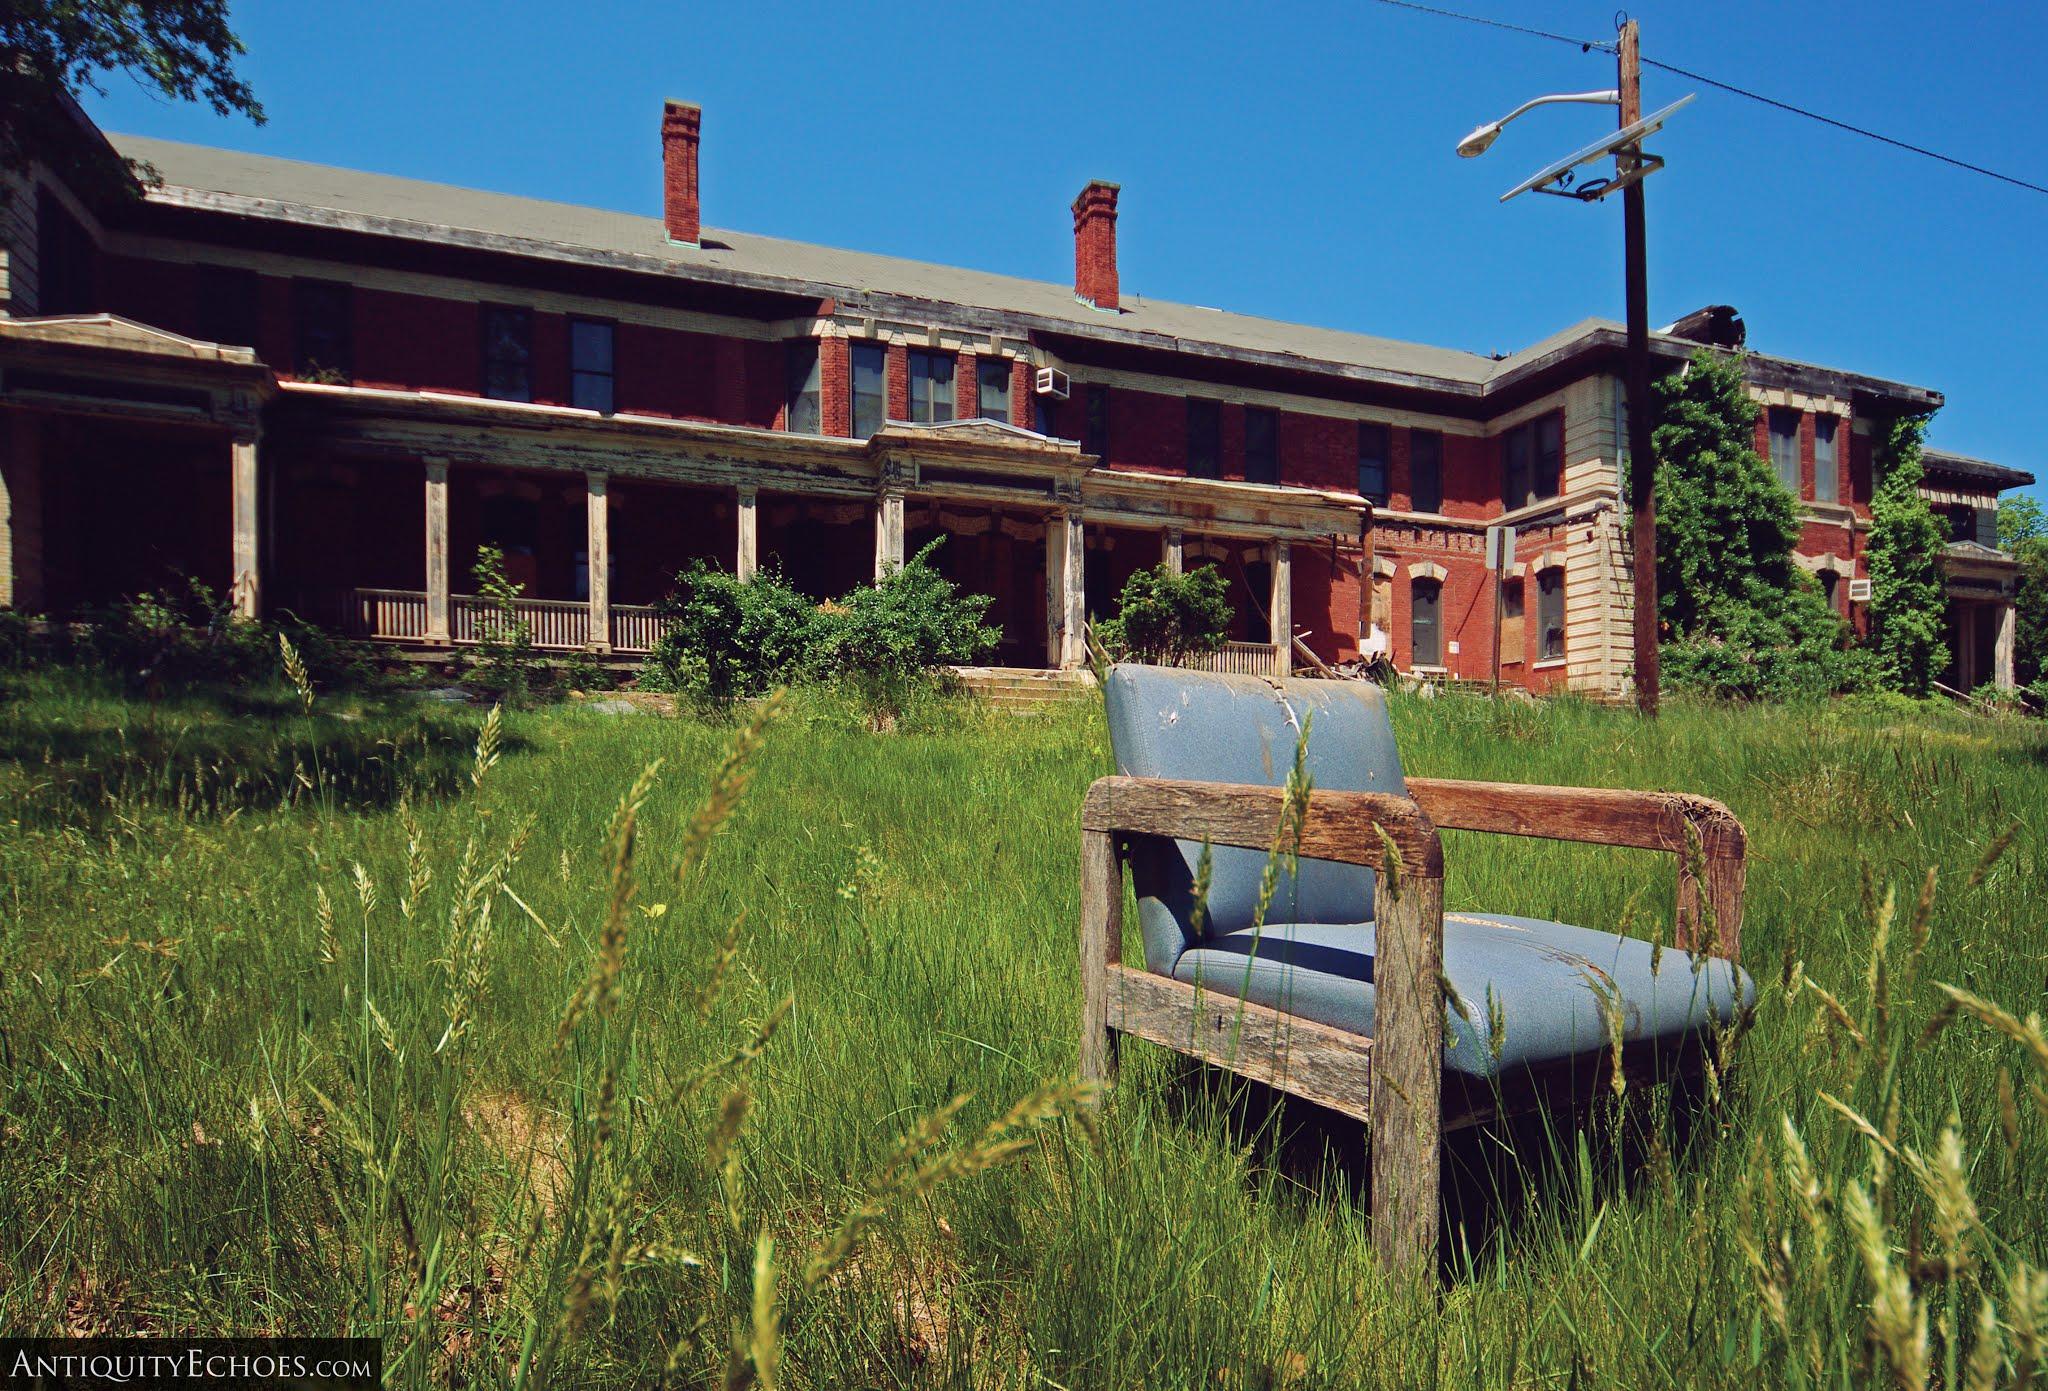 Overbrook Asylum - Indoor Furniture Turned Outdoor